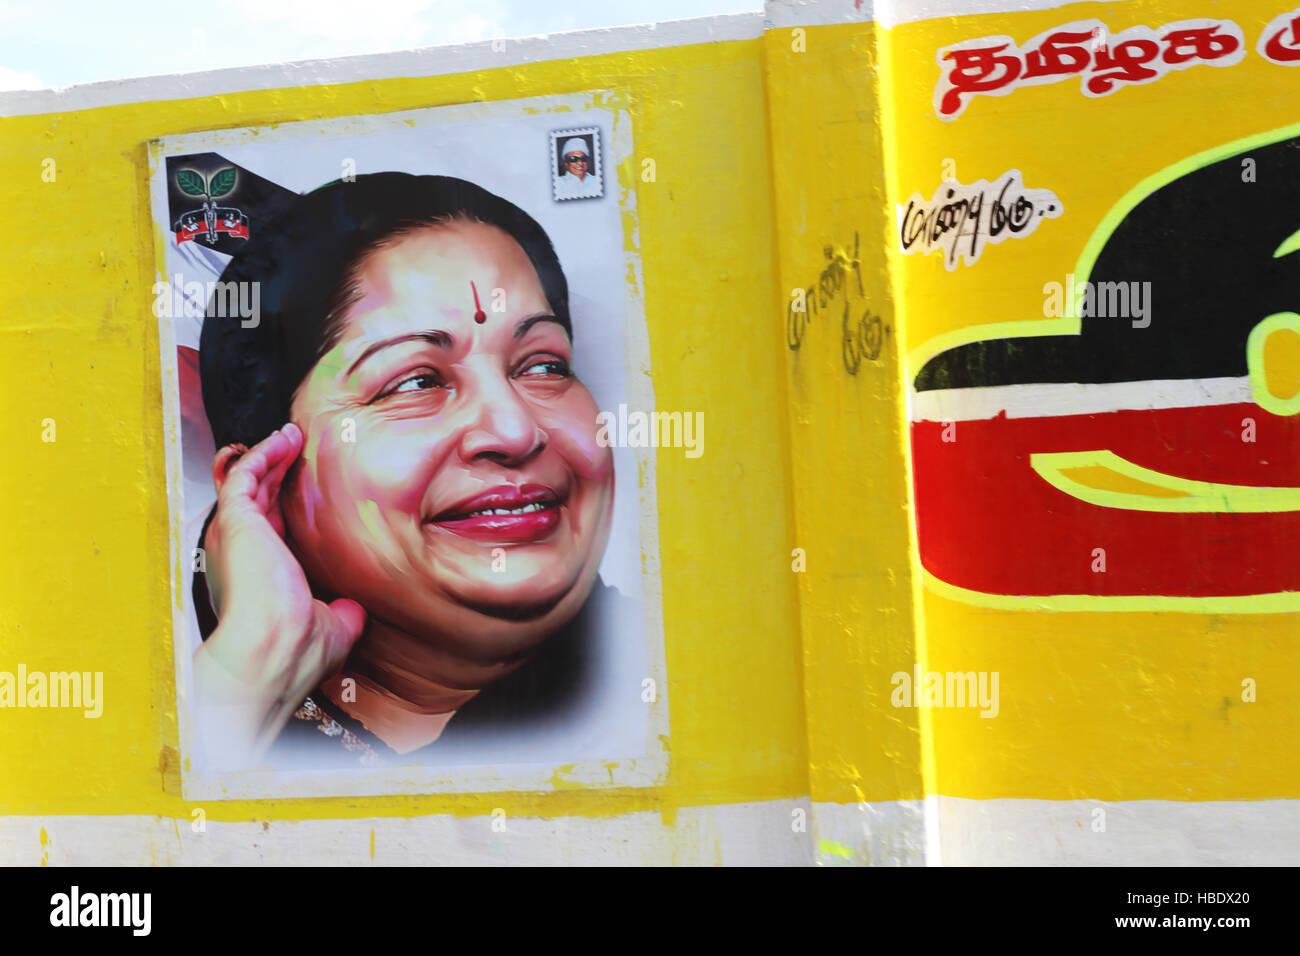 Poster of Jayalalitha Jayaraman, former actress, state minister of Tamil Nadu. - Stock Image